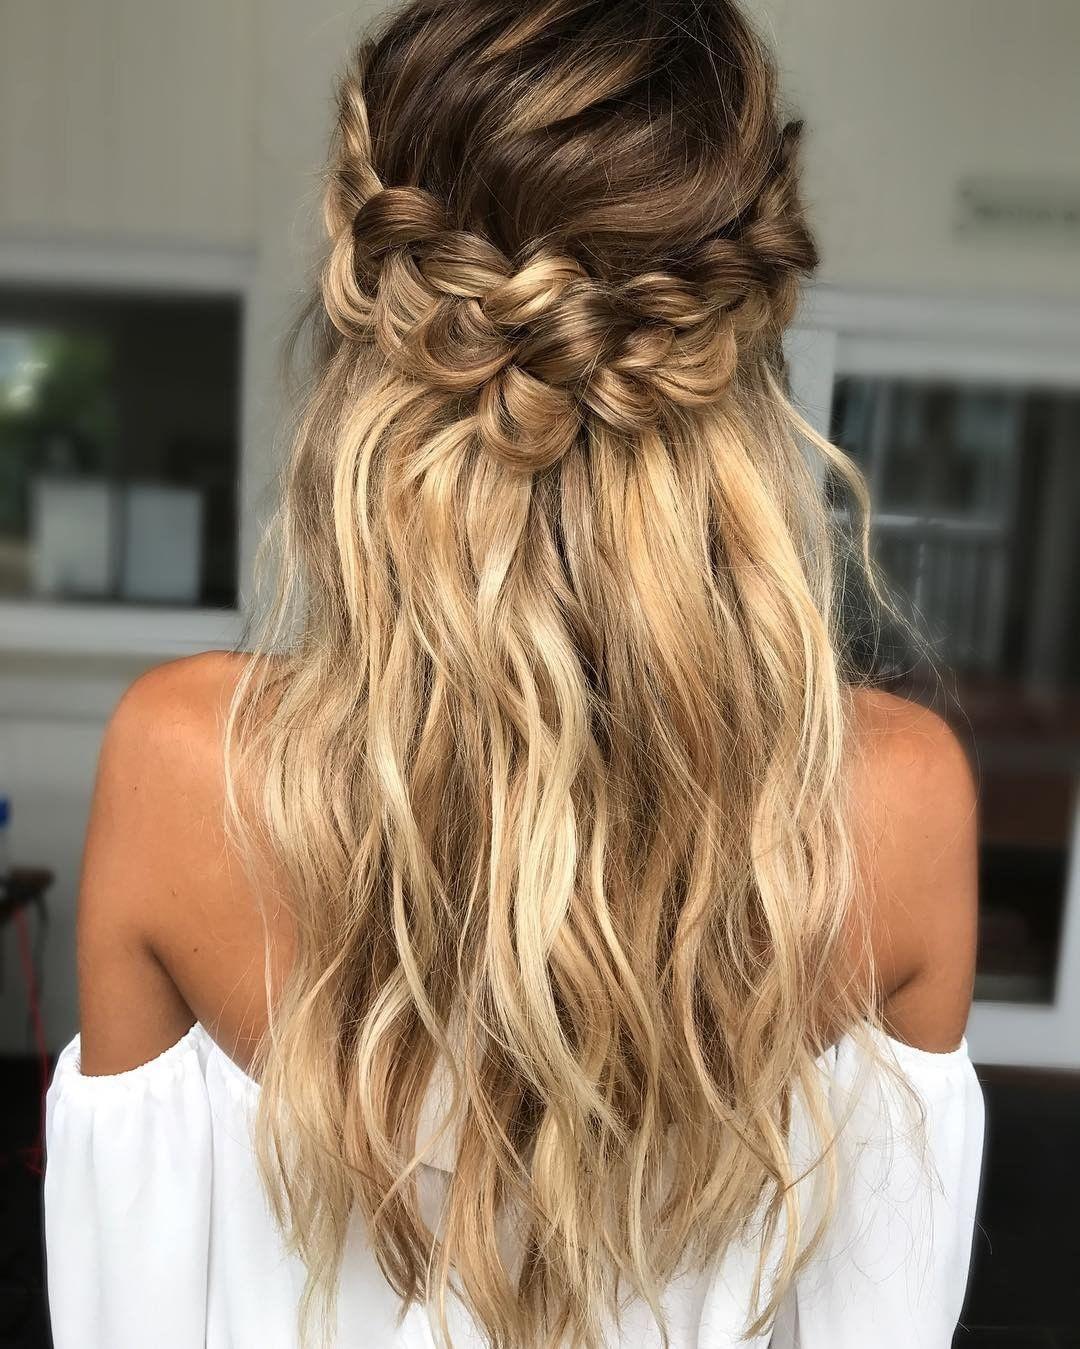 Une Coiffure Boheme Chic Qui Nous Inspire Le Printemps Lookdujour Ldj Hair Hairdo Updo Braided Hairstyles For Wedding Hair Styles Loose Curls Hairstyles